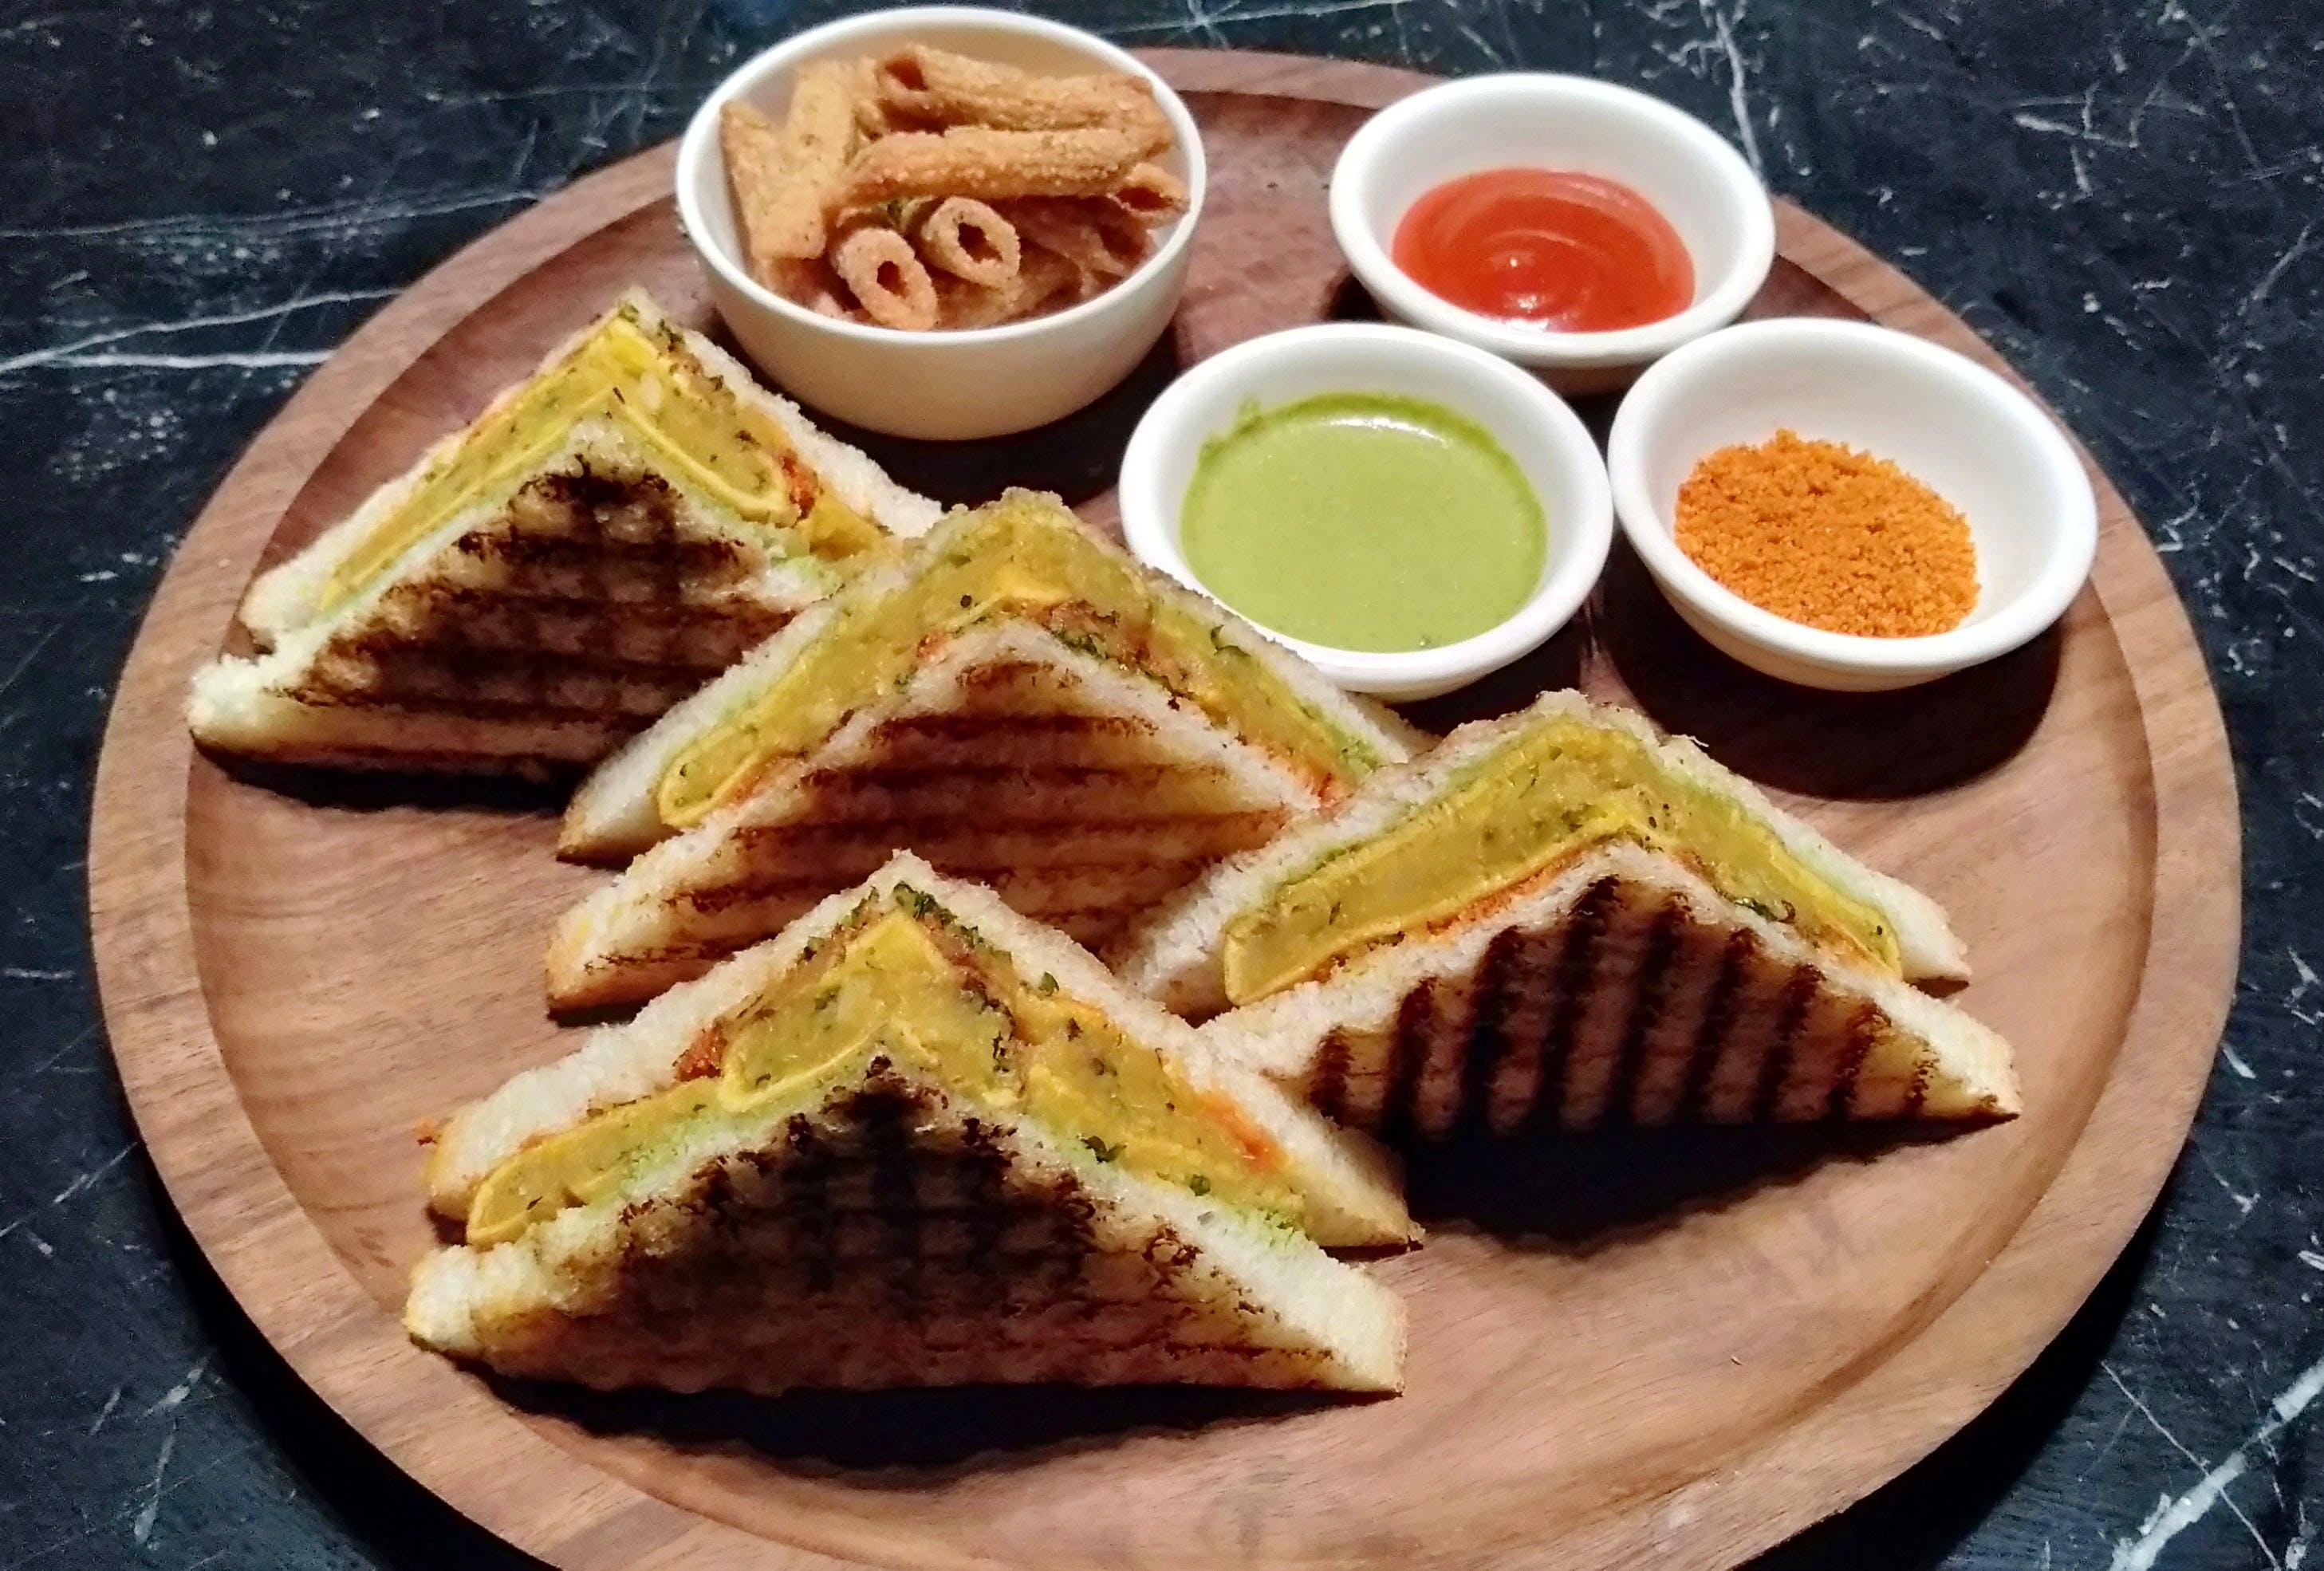 Dish,Food,Cuisine,Ingredient,Breakfast,Waffle,Baked goods,Finger food,Comfort food,Produce